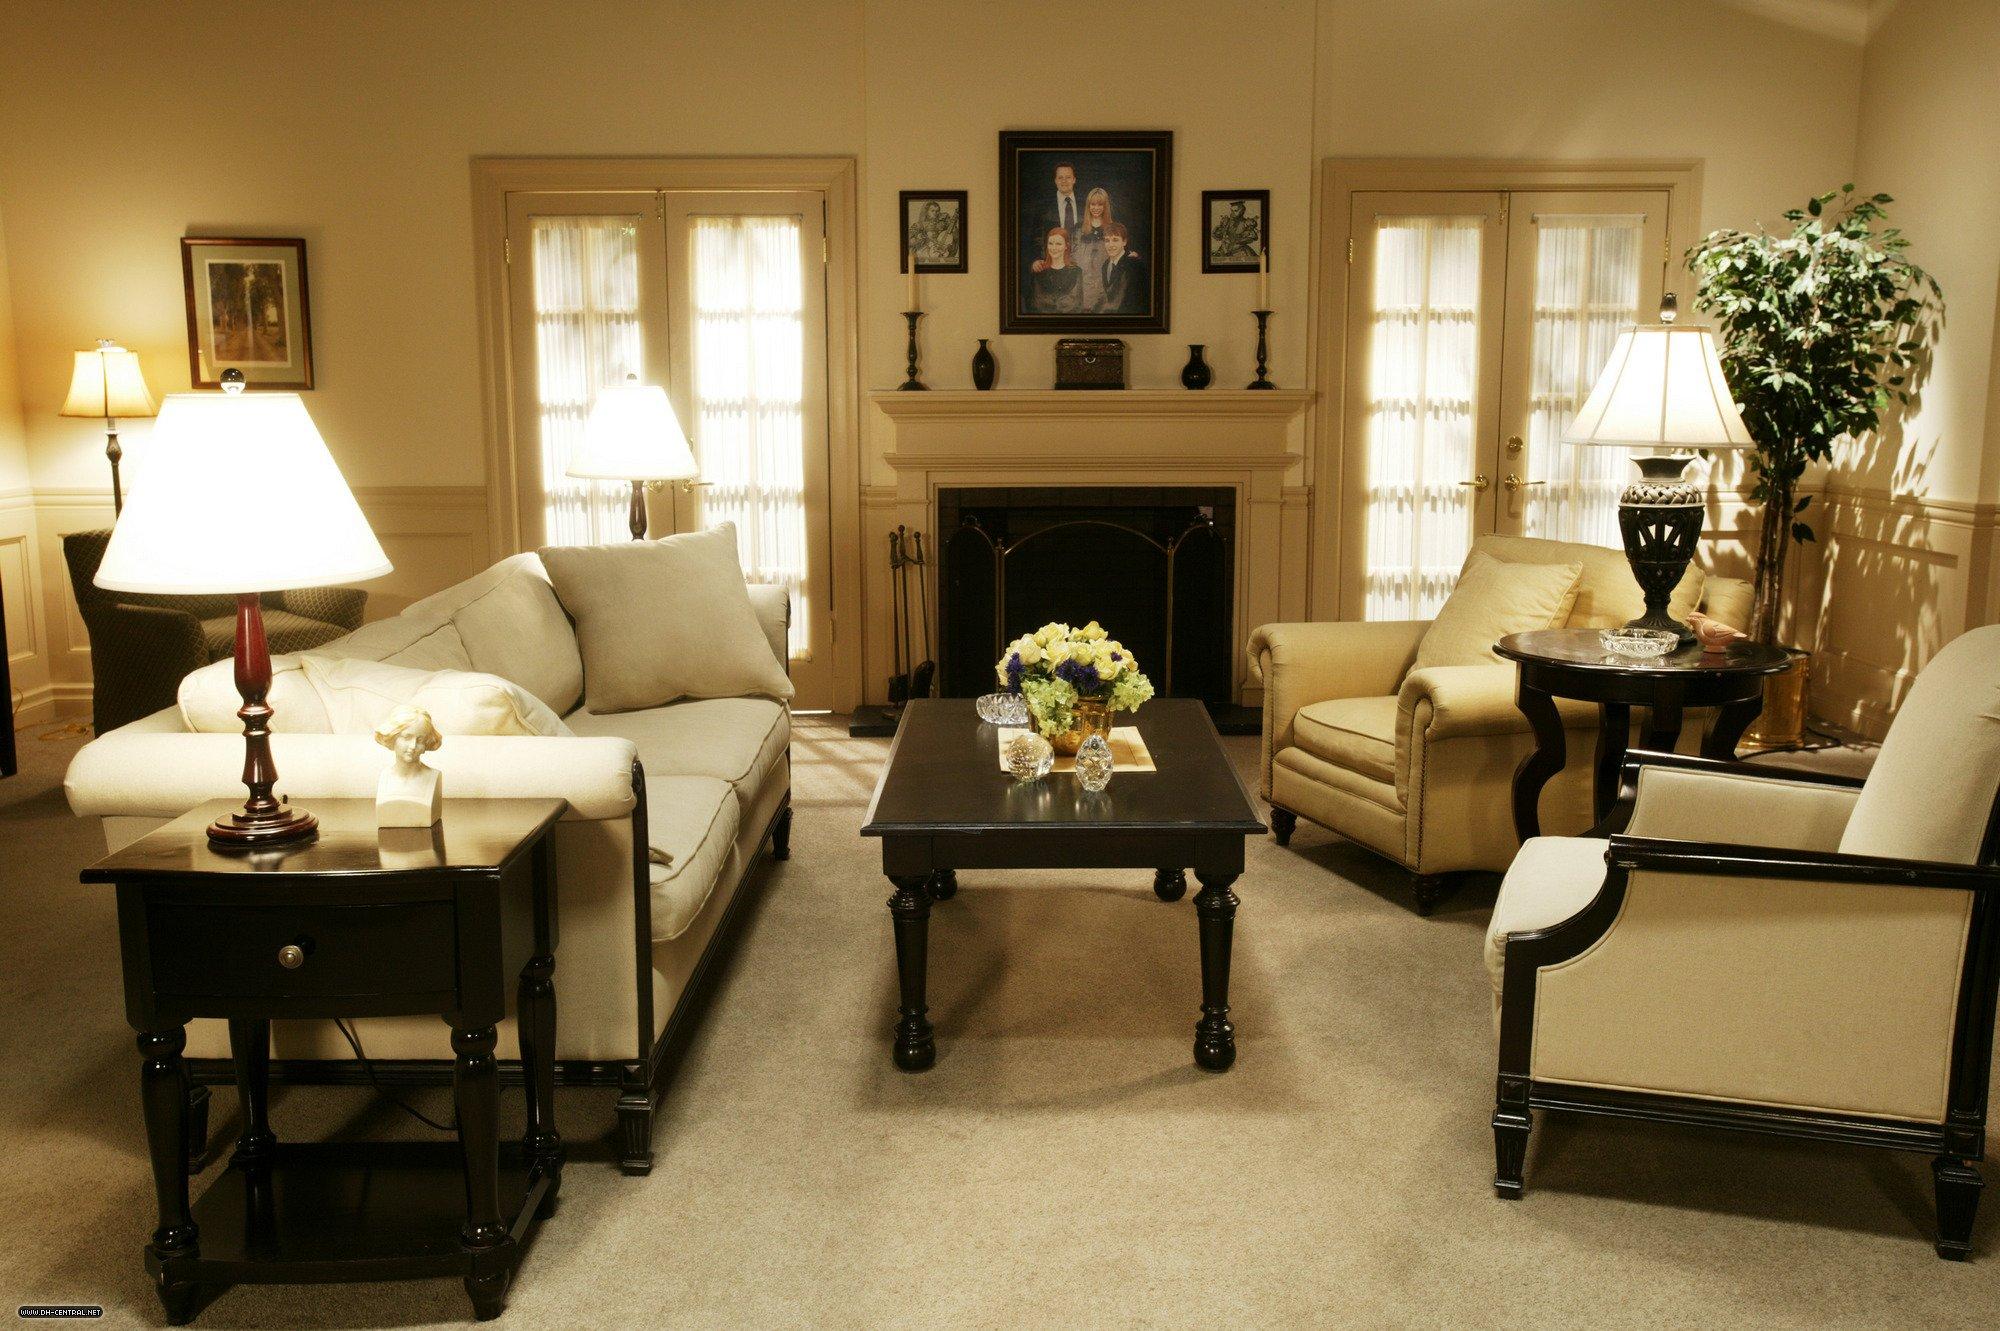 interieur maison bree van de kamp. Black Bedroom Furniture Sets. Home Design Ideas